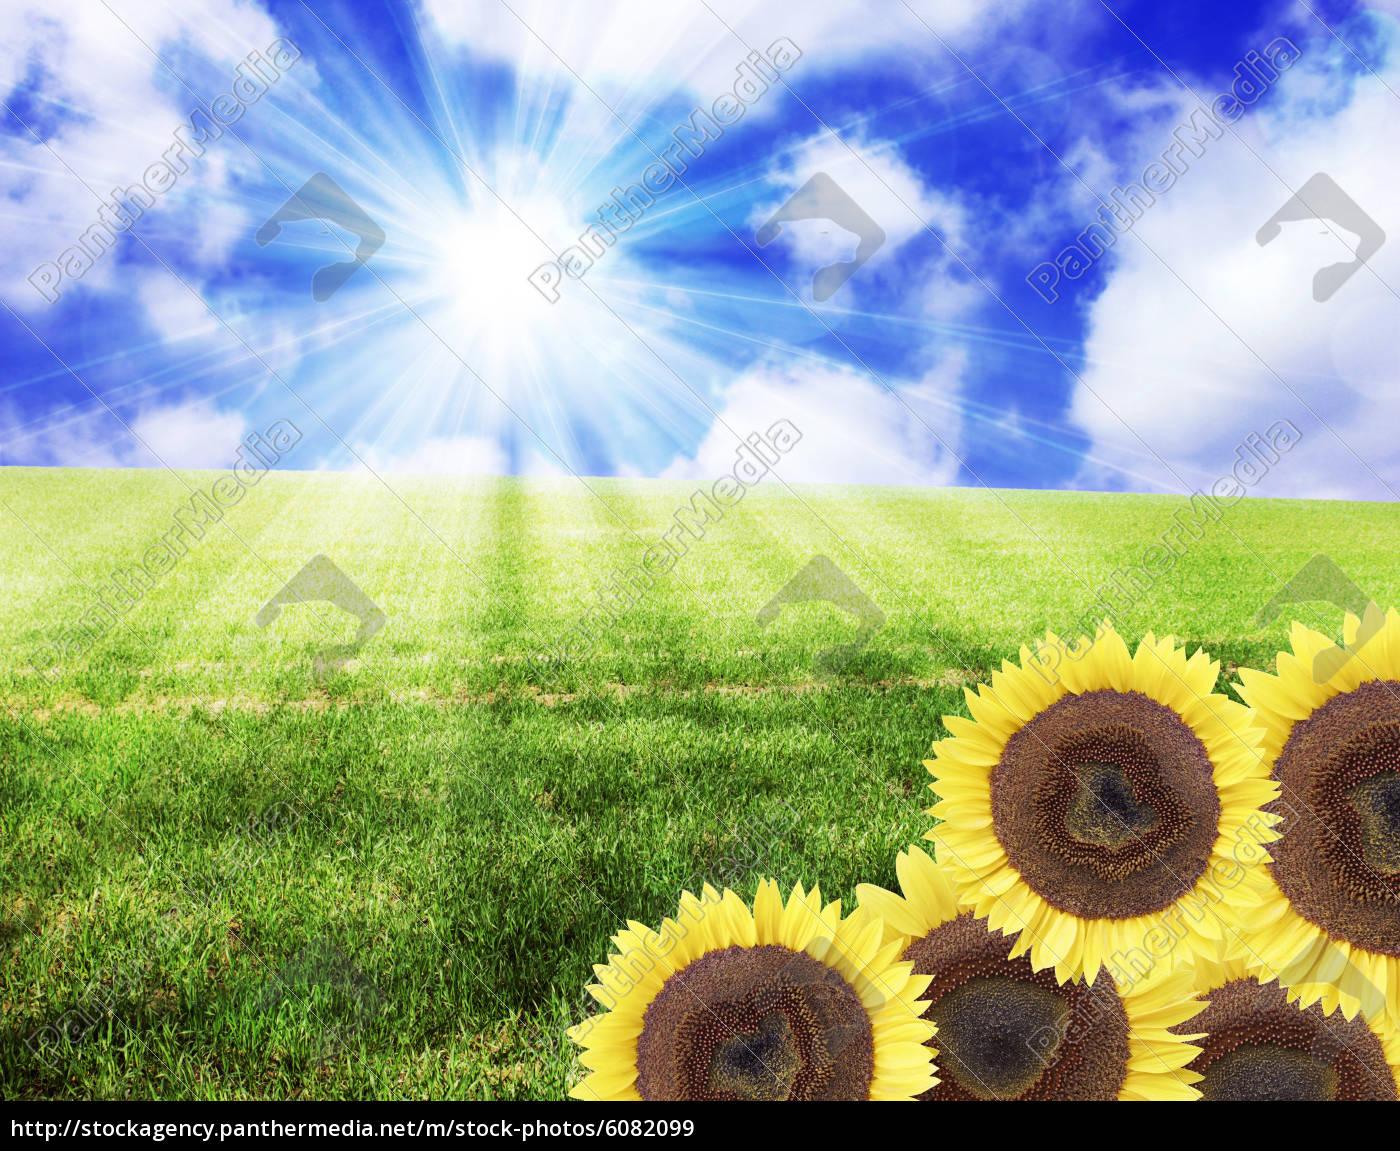 landschaft natur sonnenblumen symbol - Lizenzfreies Bild - #6082099 ...